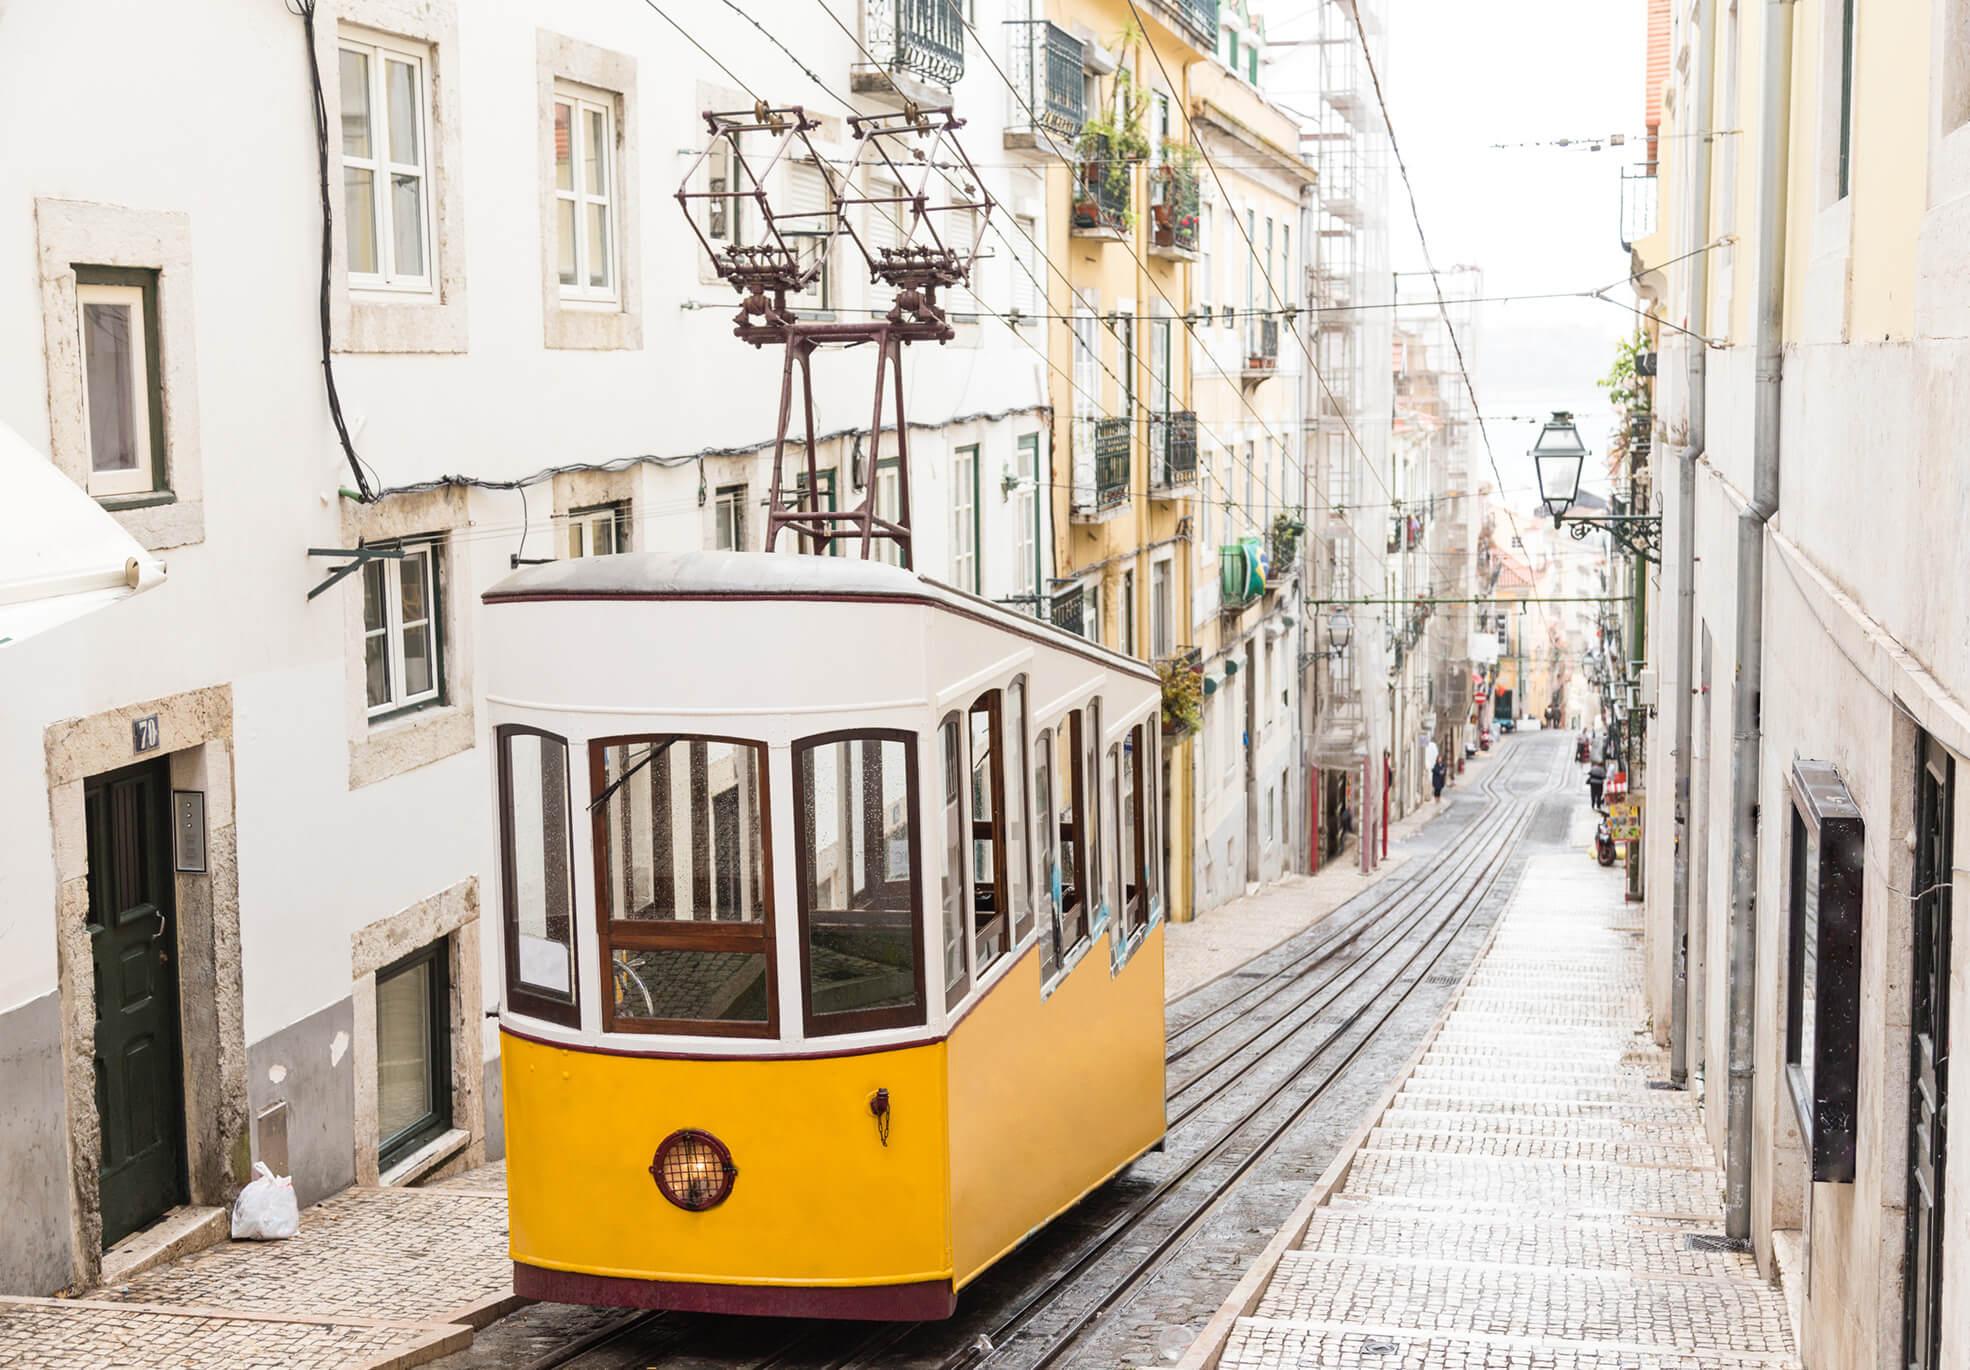 Besten Expat-Städte